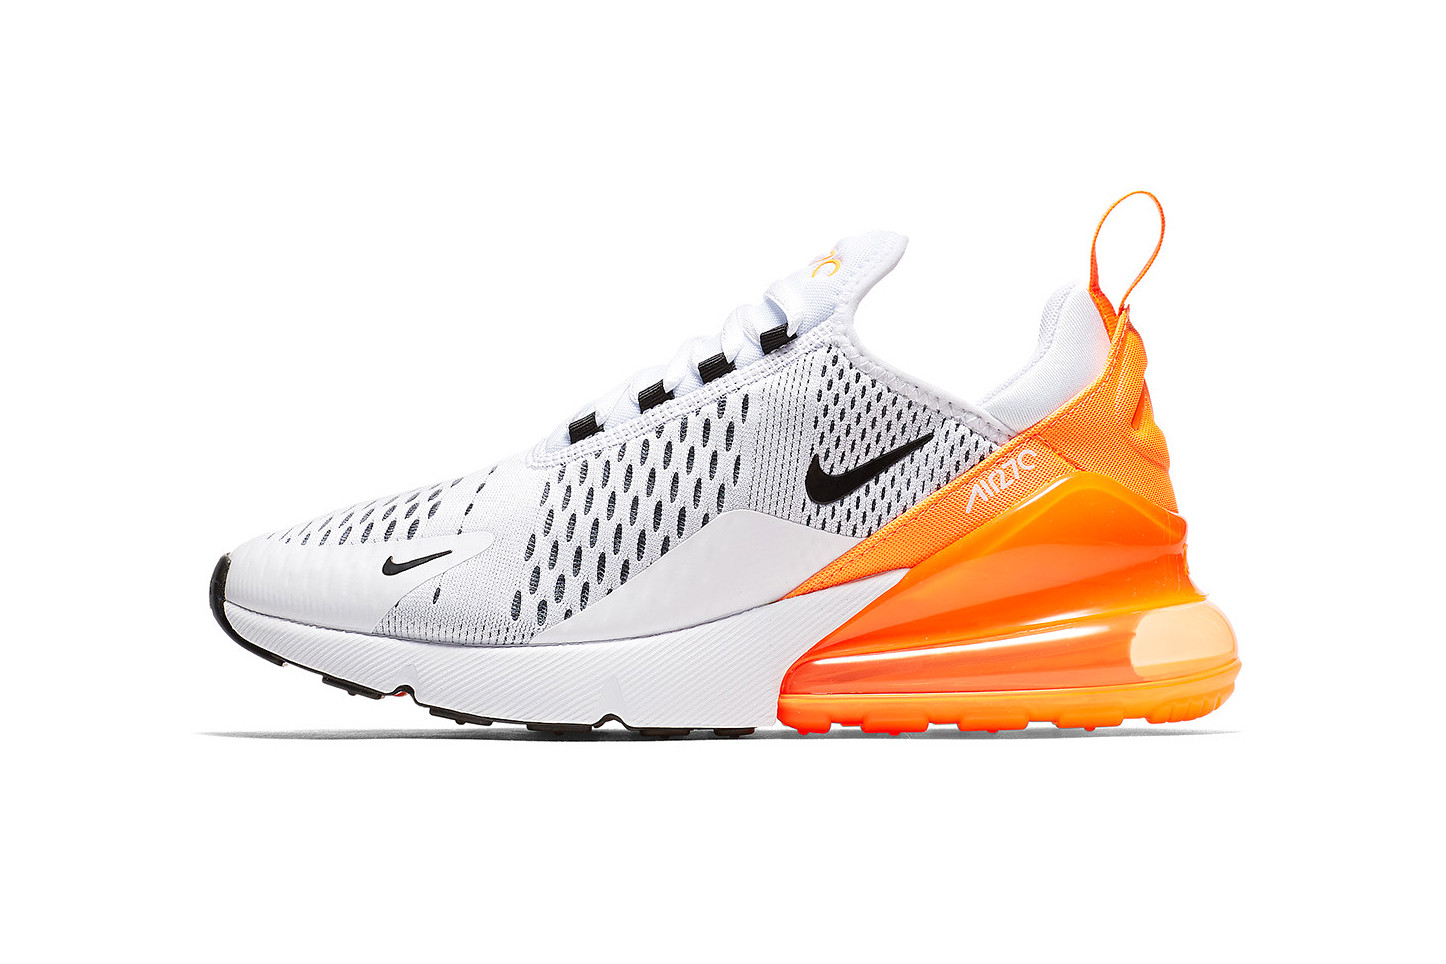 Nike Air Max 270 in White, Orange